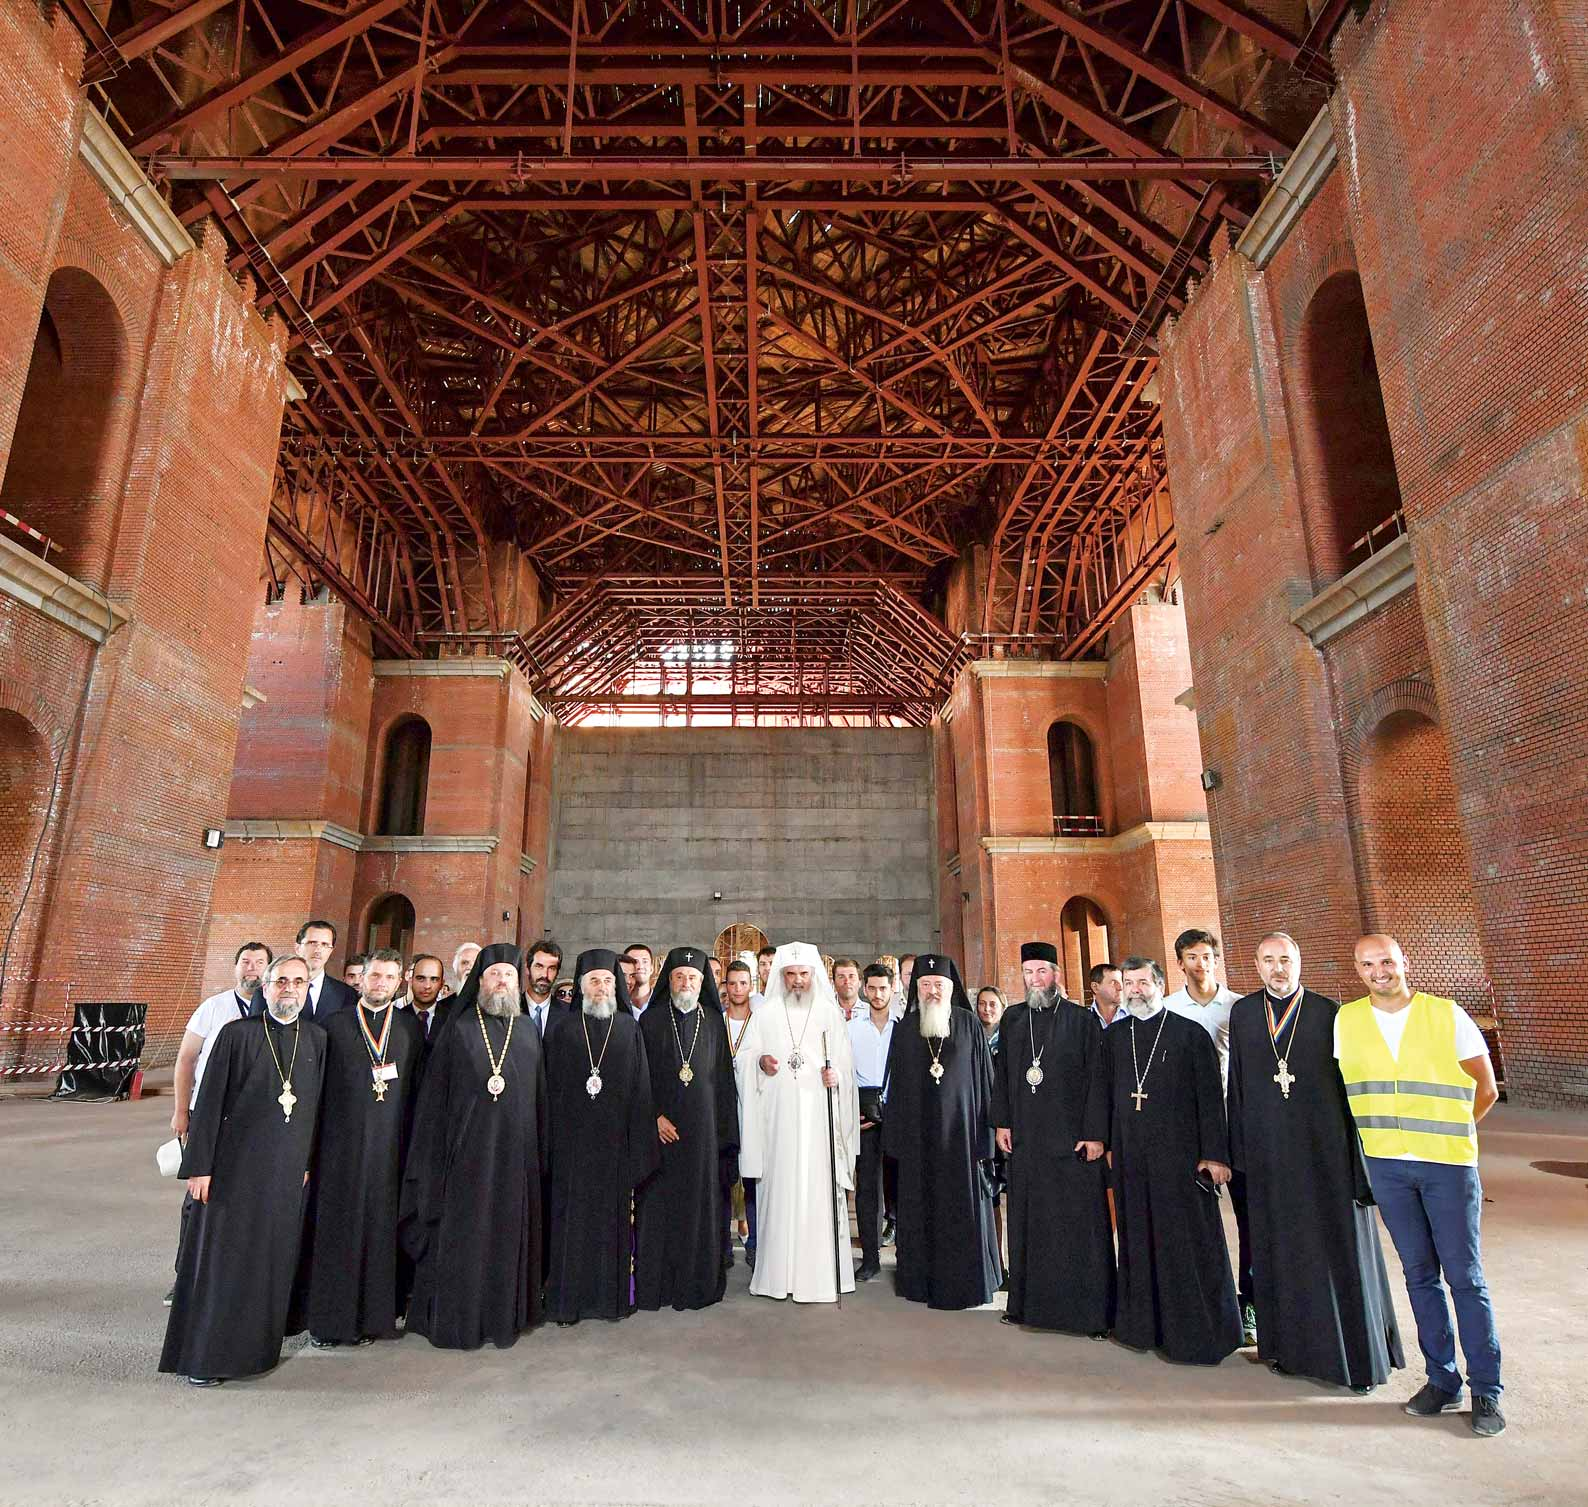 Catedrala Mântuirii Neamului – inima spirituală a României / The Cathedral of National Salvation – the spiritual heart of Romania